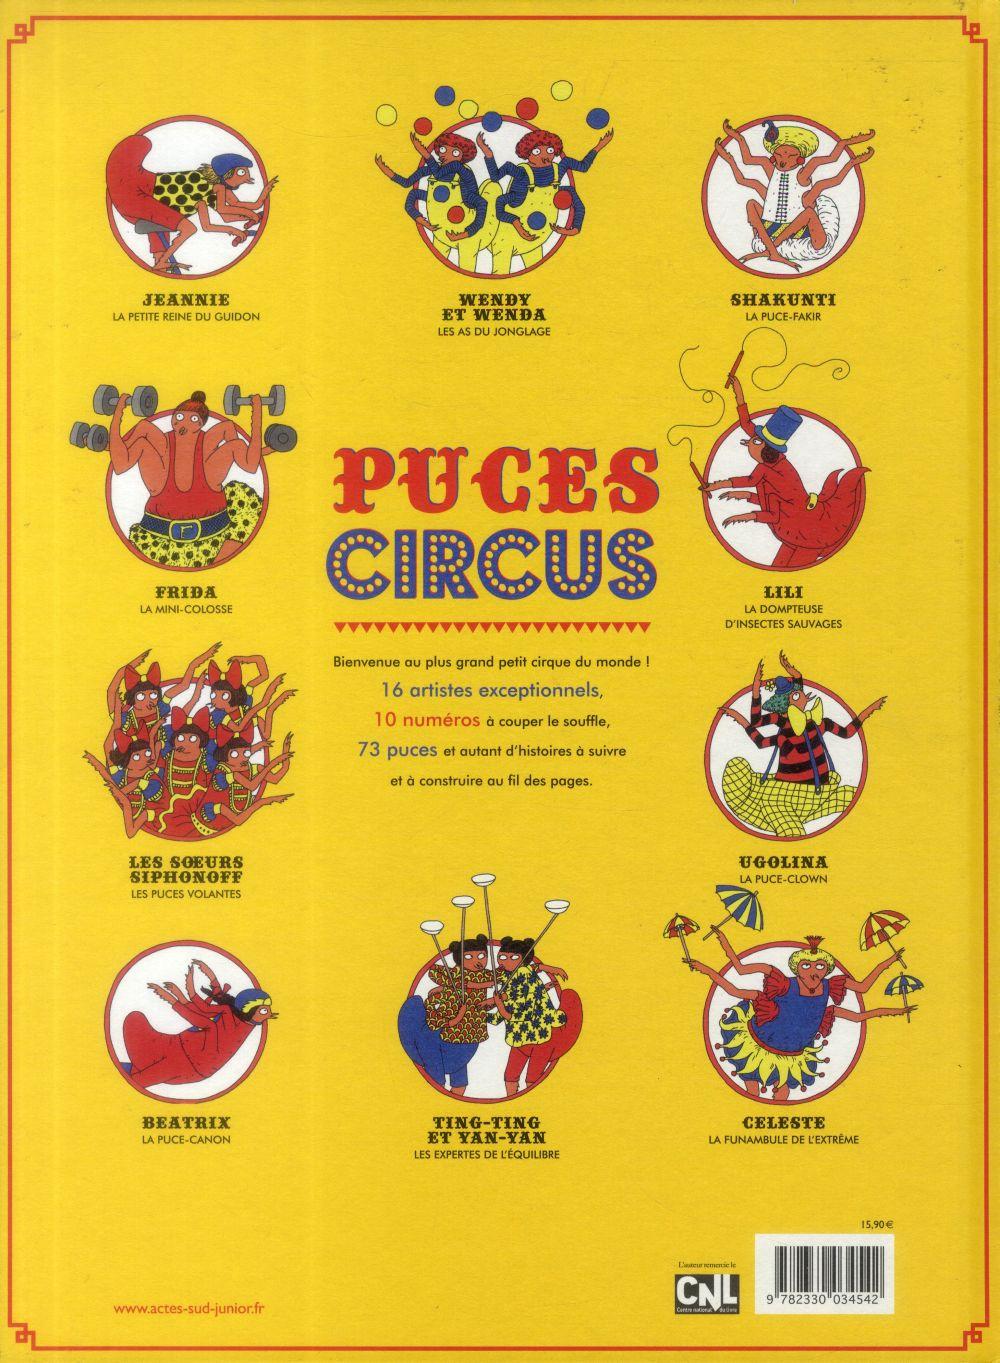 Puces circus